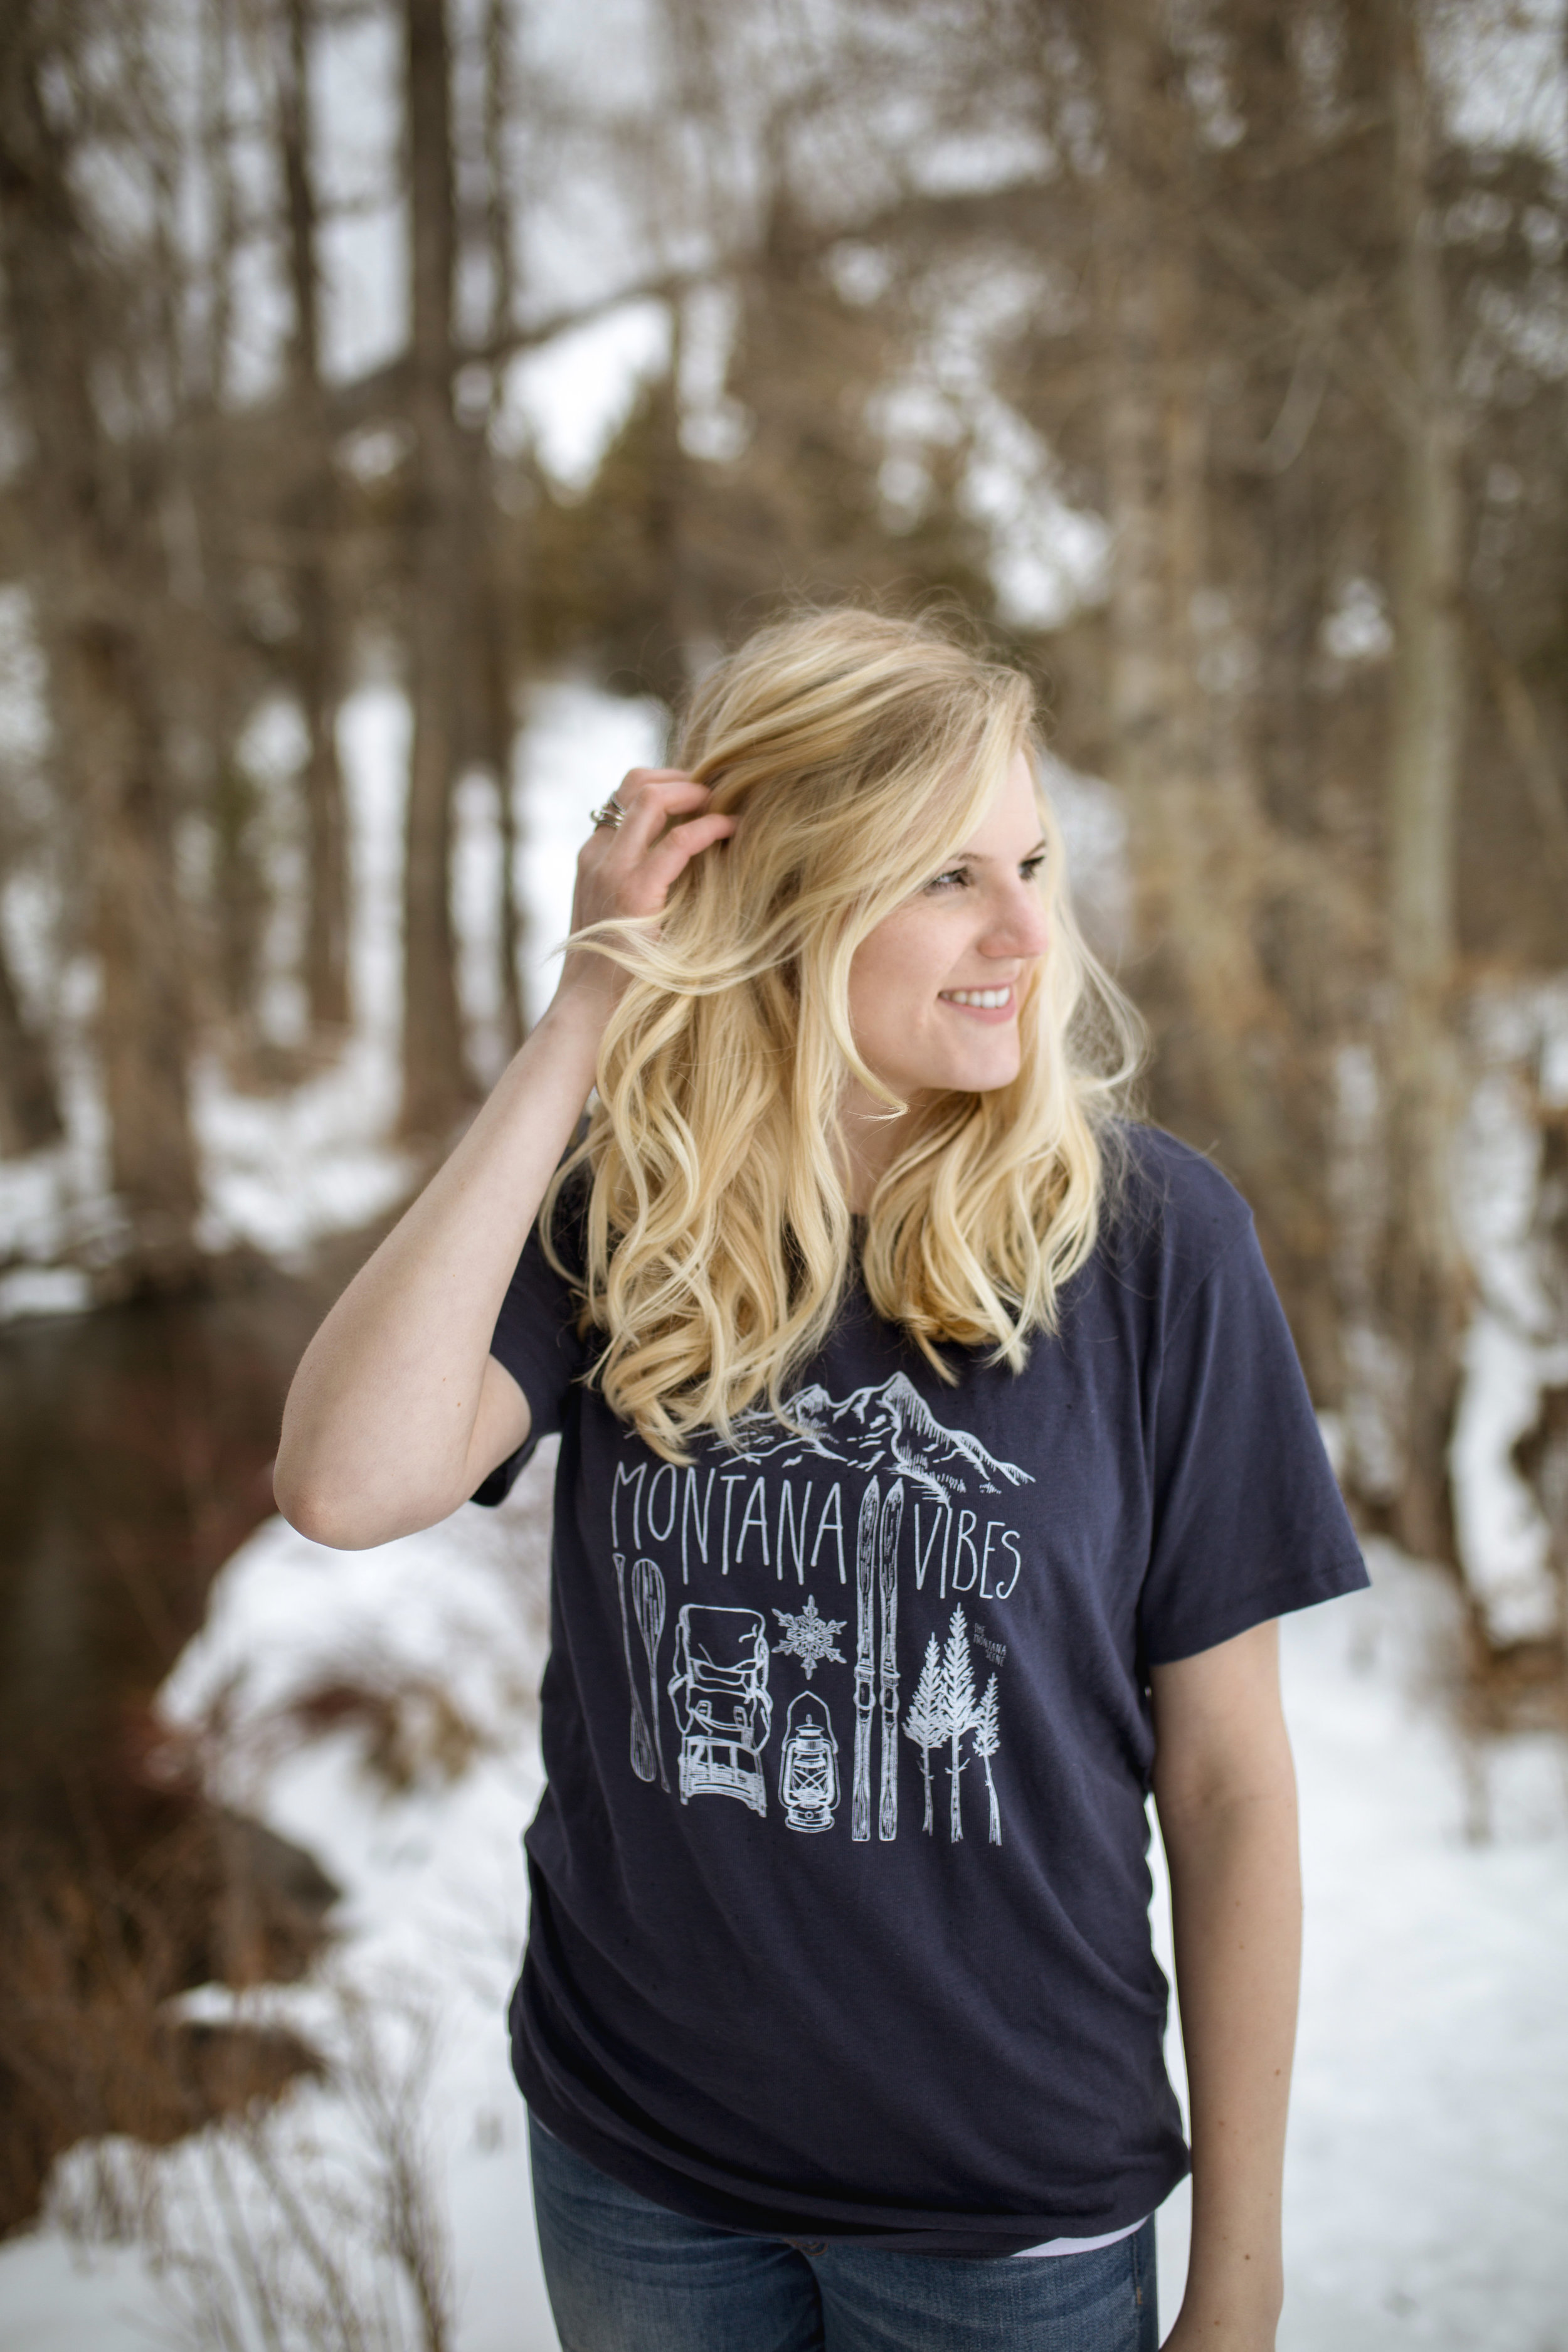 "The Montana Scene ""Montana Vibes"" tee shirt by blogger Bri Sul. Camping, skiing, hiking, outdoors,"